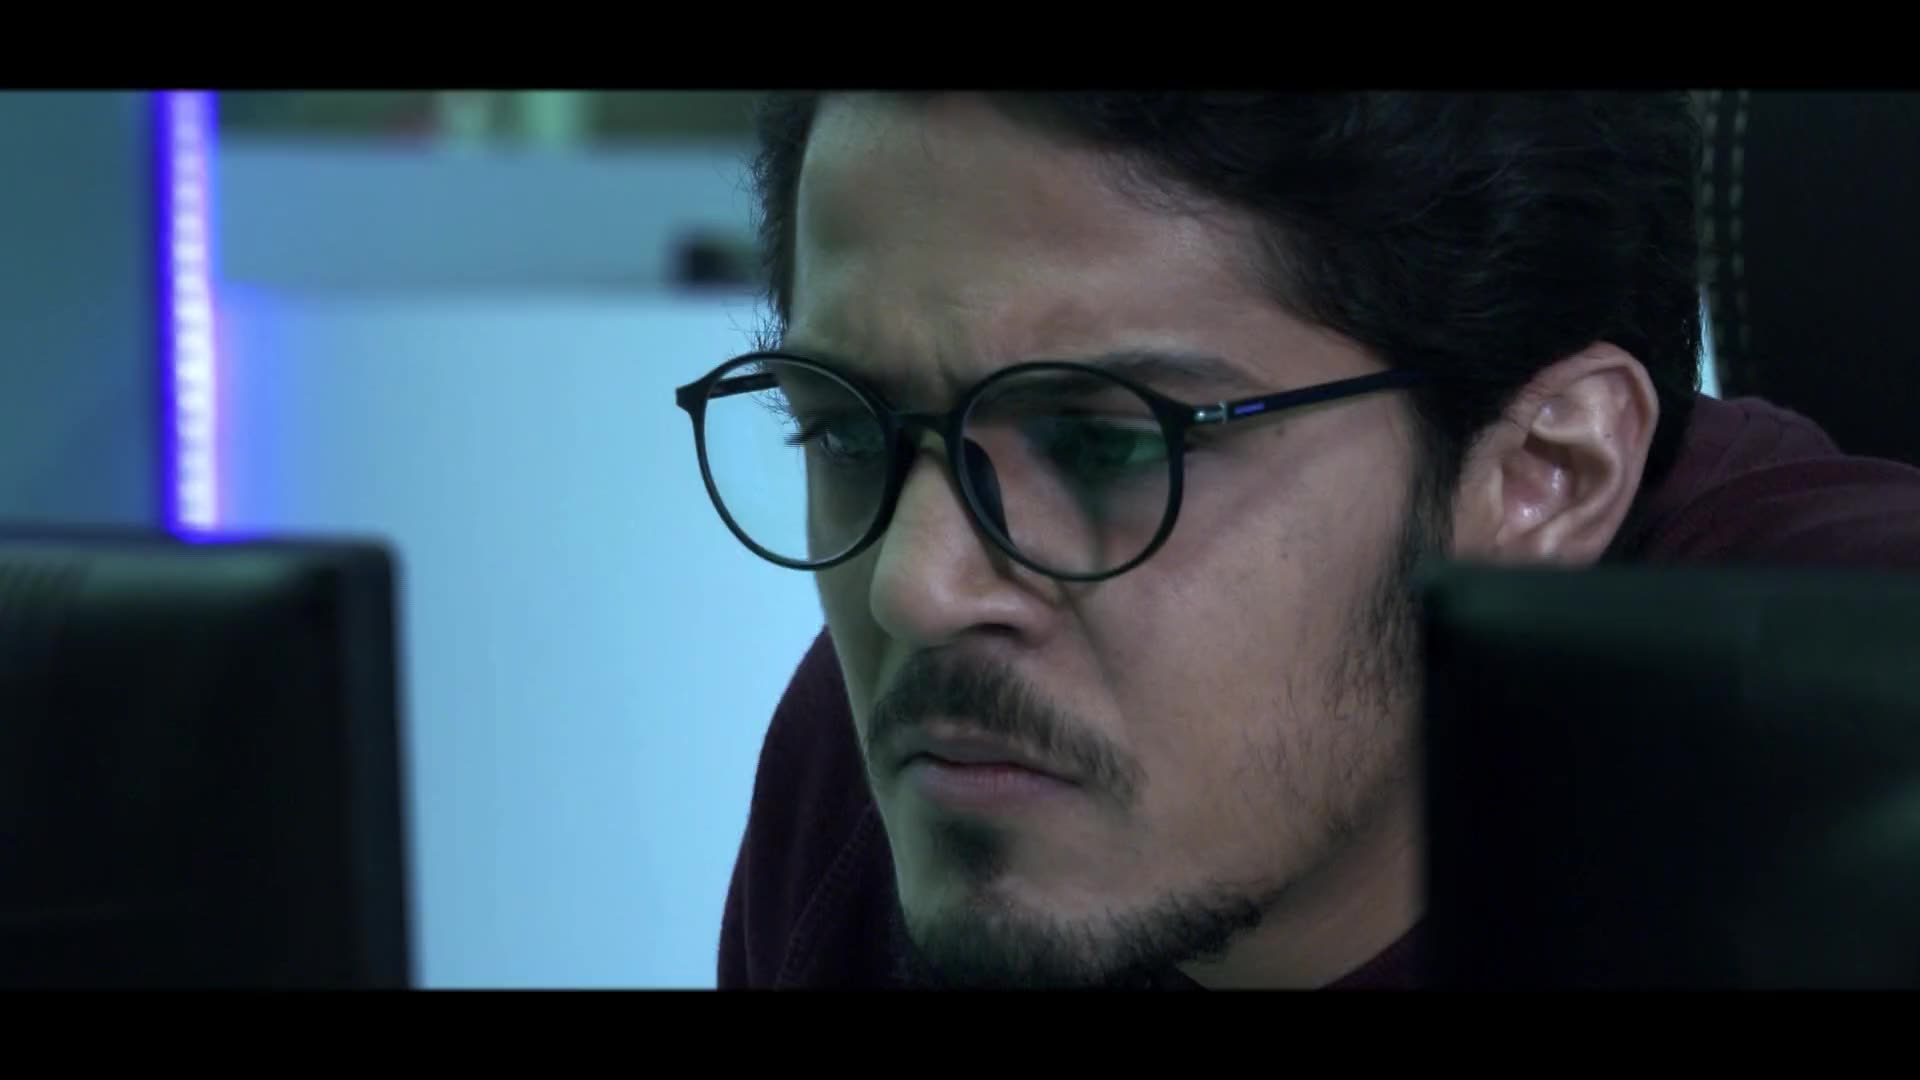 قسمت 8 سریال گاندو